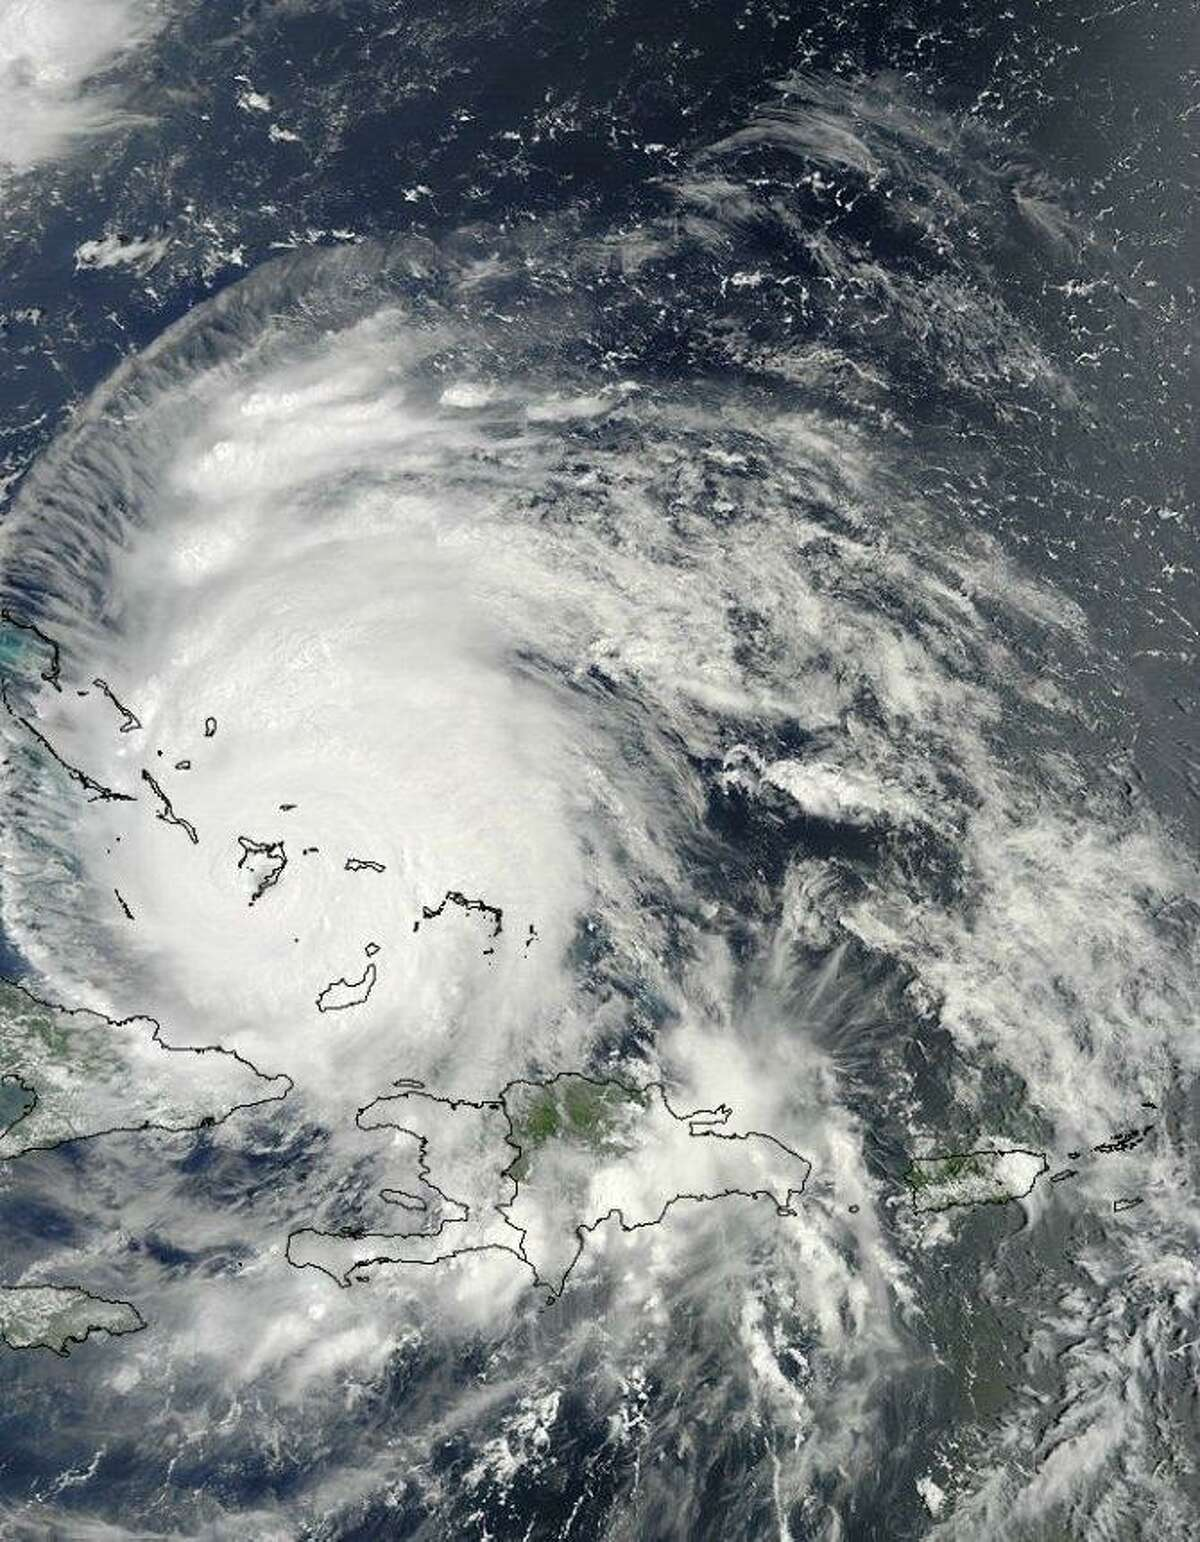 Image Credit: NASA Goddard MODIS Rapid Response.